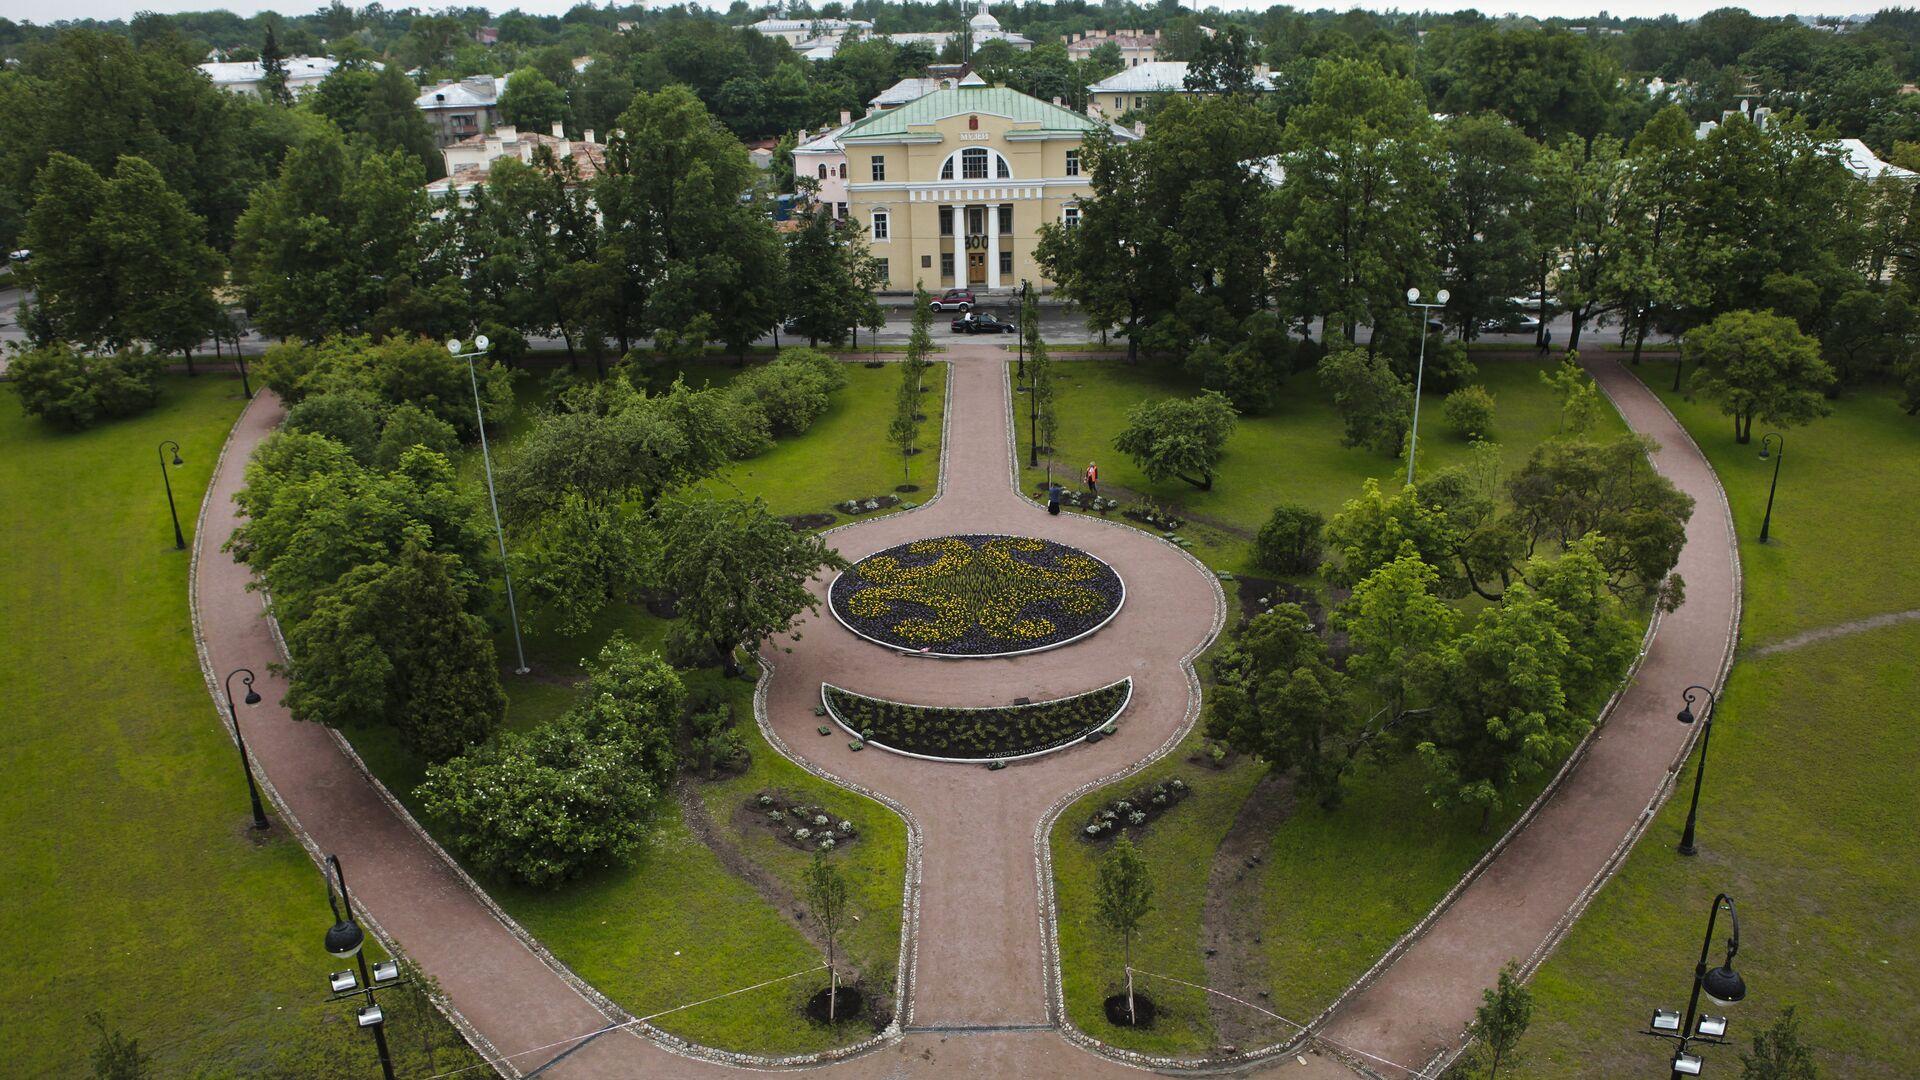 Царское Село - РИА Новости, 1920, 15.07.2020